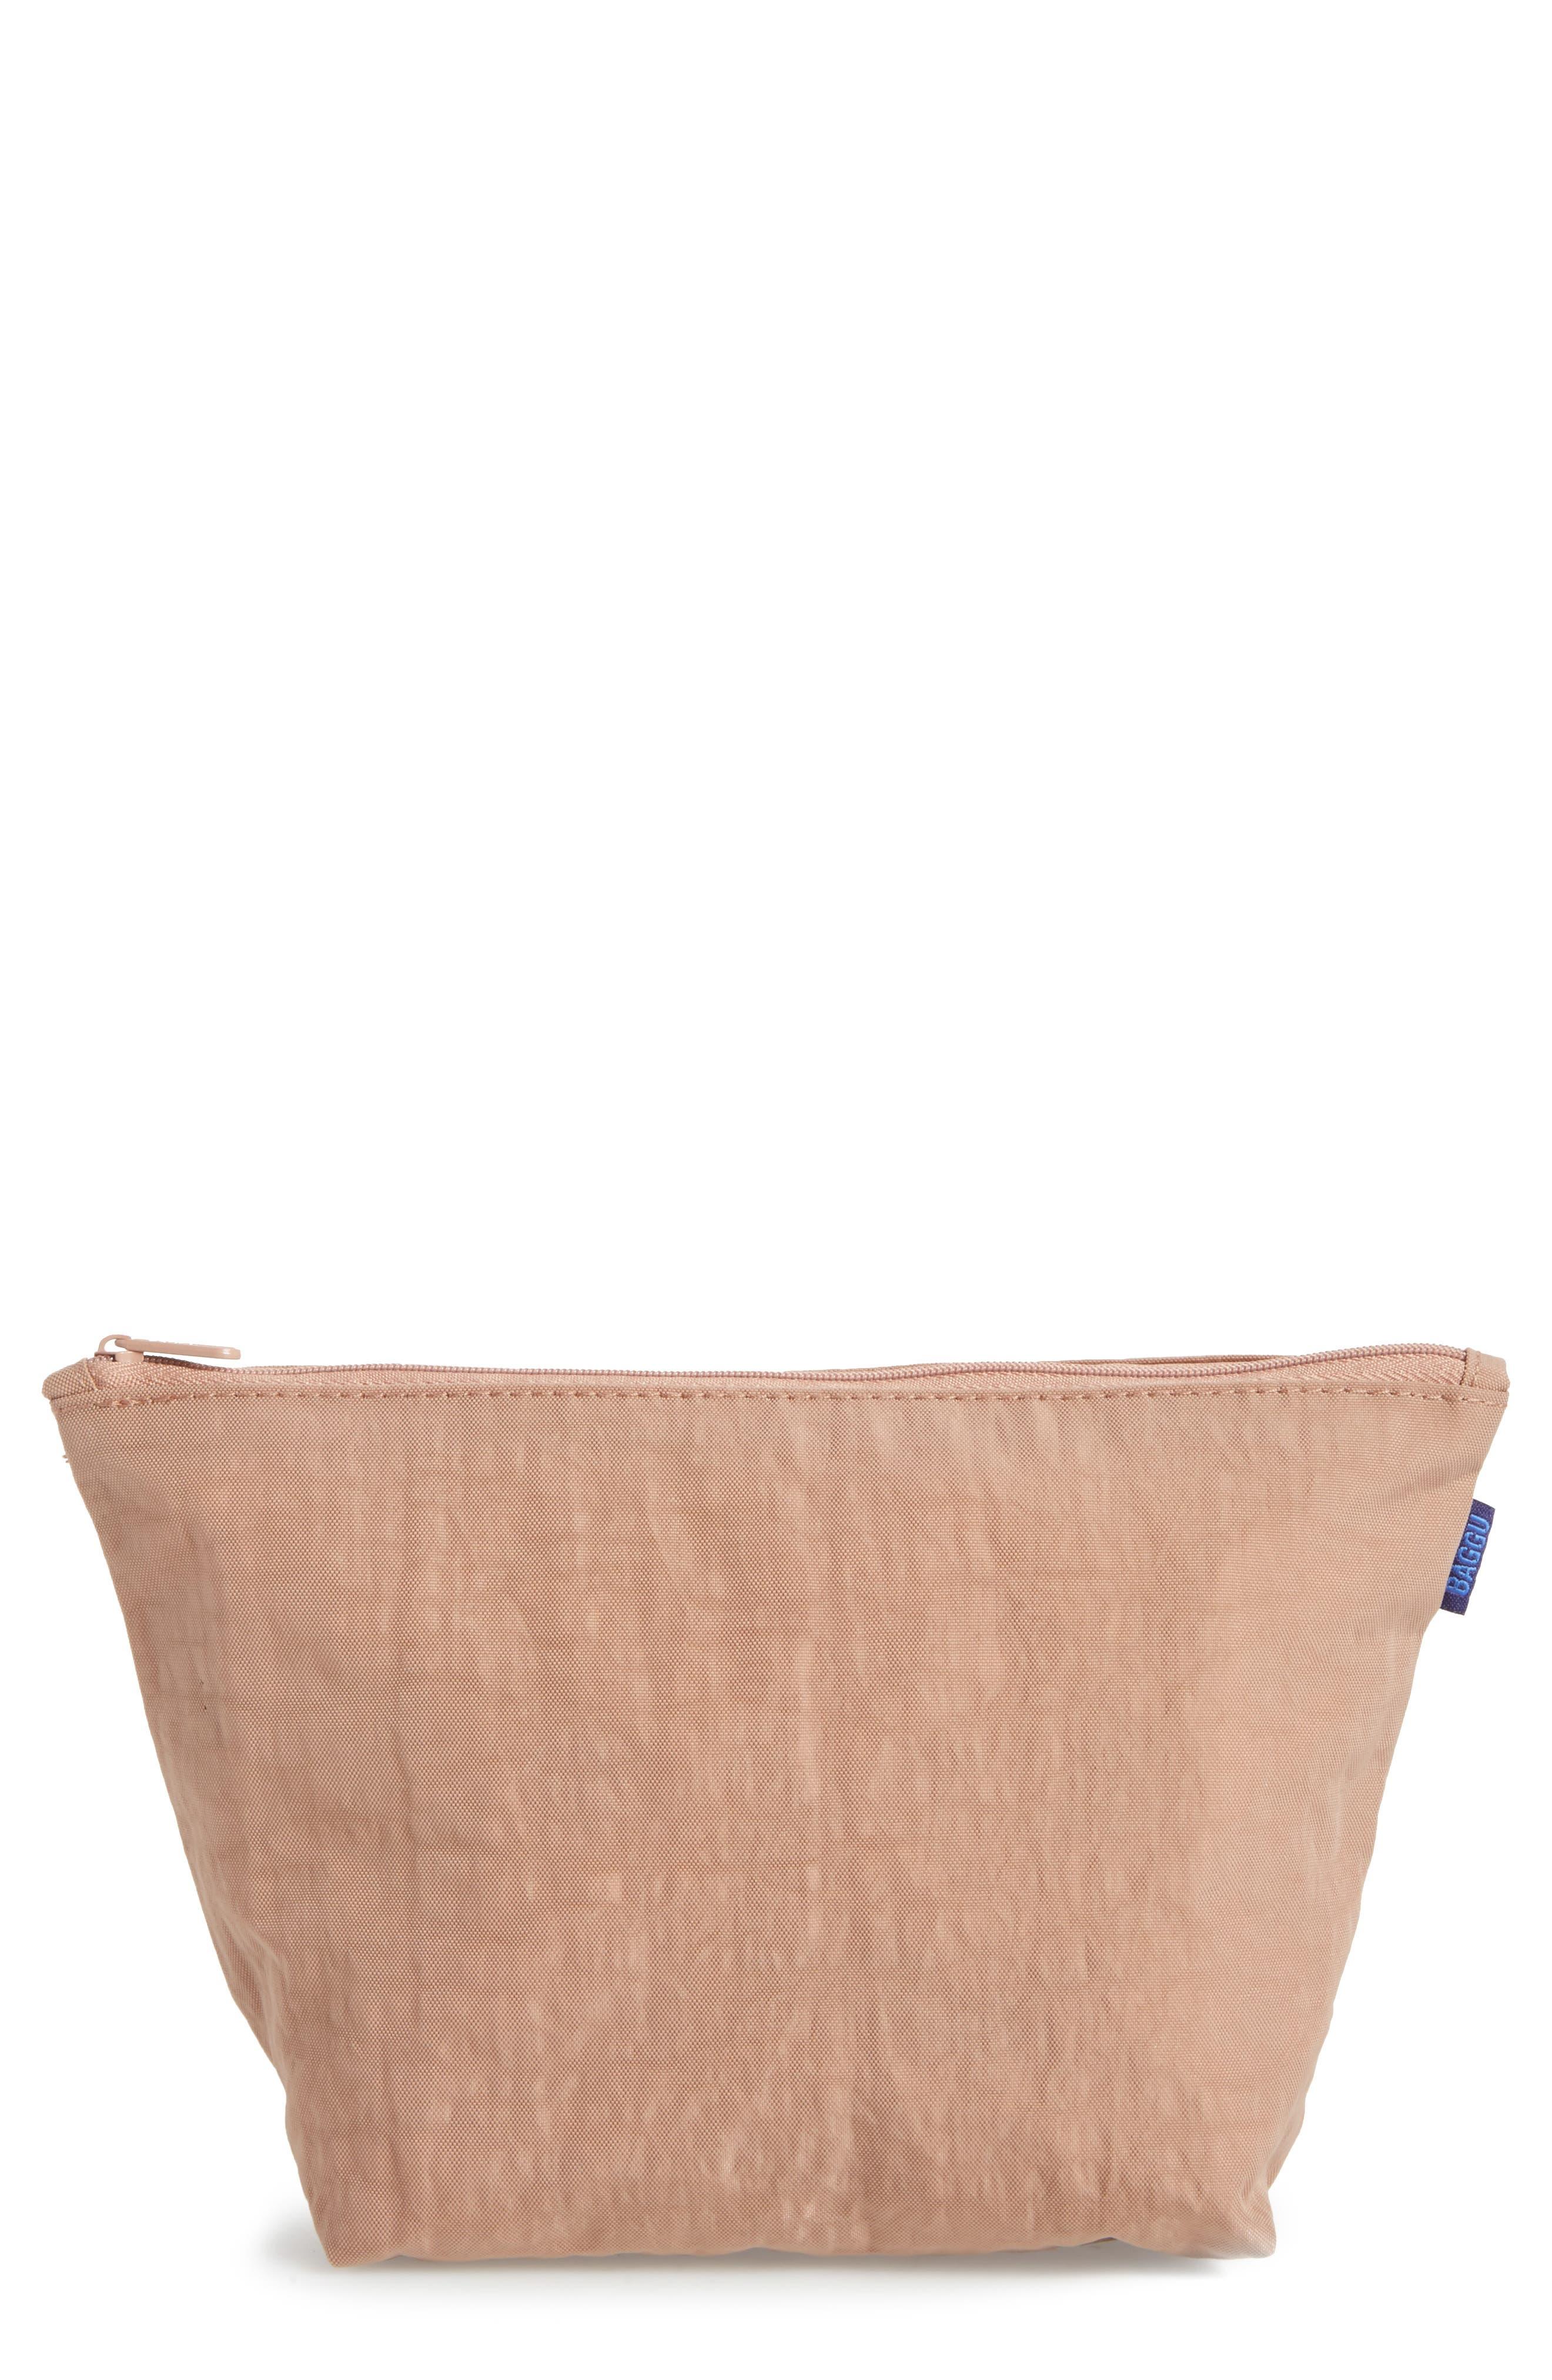 Baggu® Medium Carry All Nylon Pouch